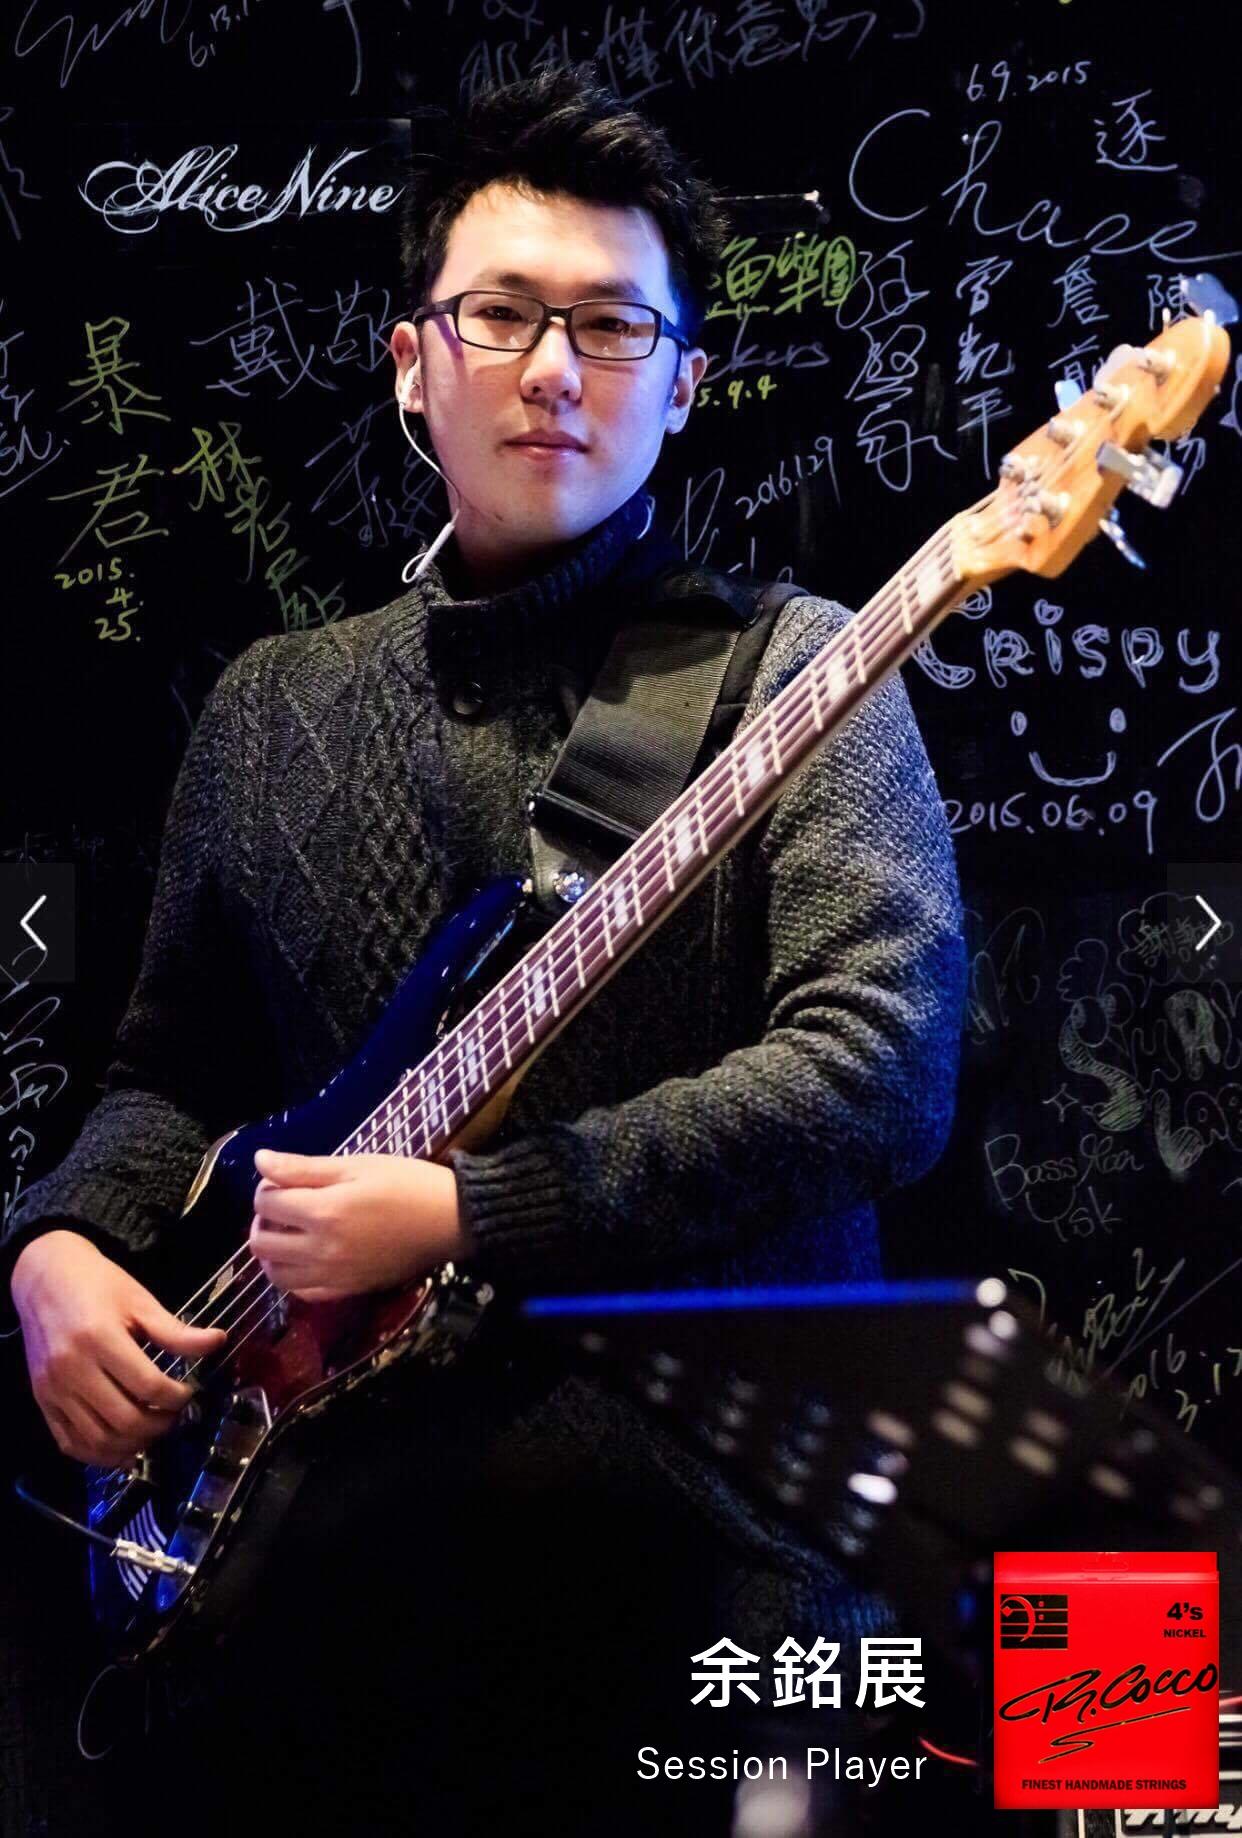 R.Cocco artist – 余銘展 (Session player)